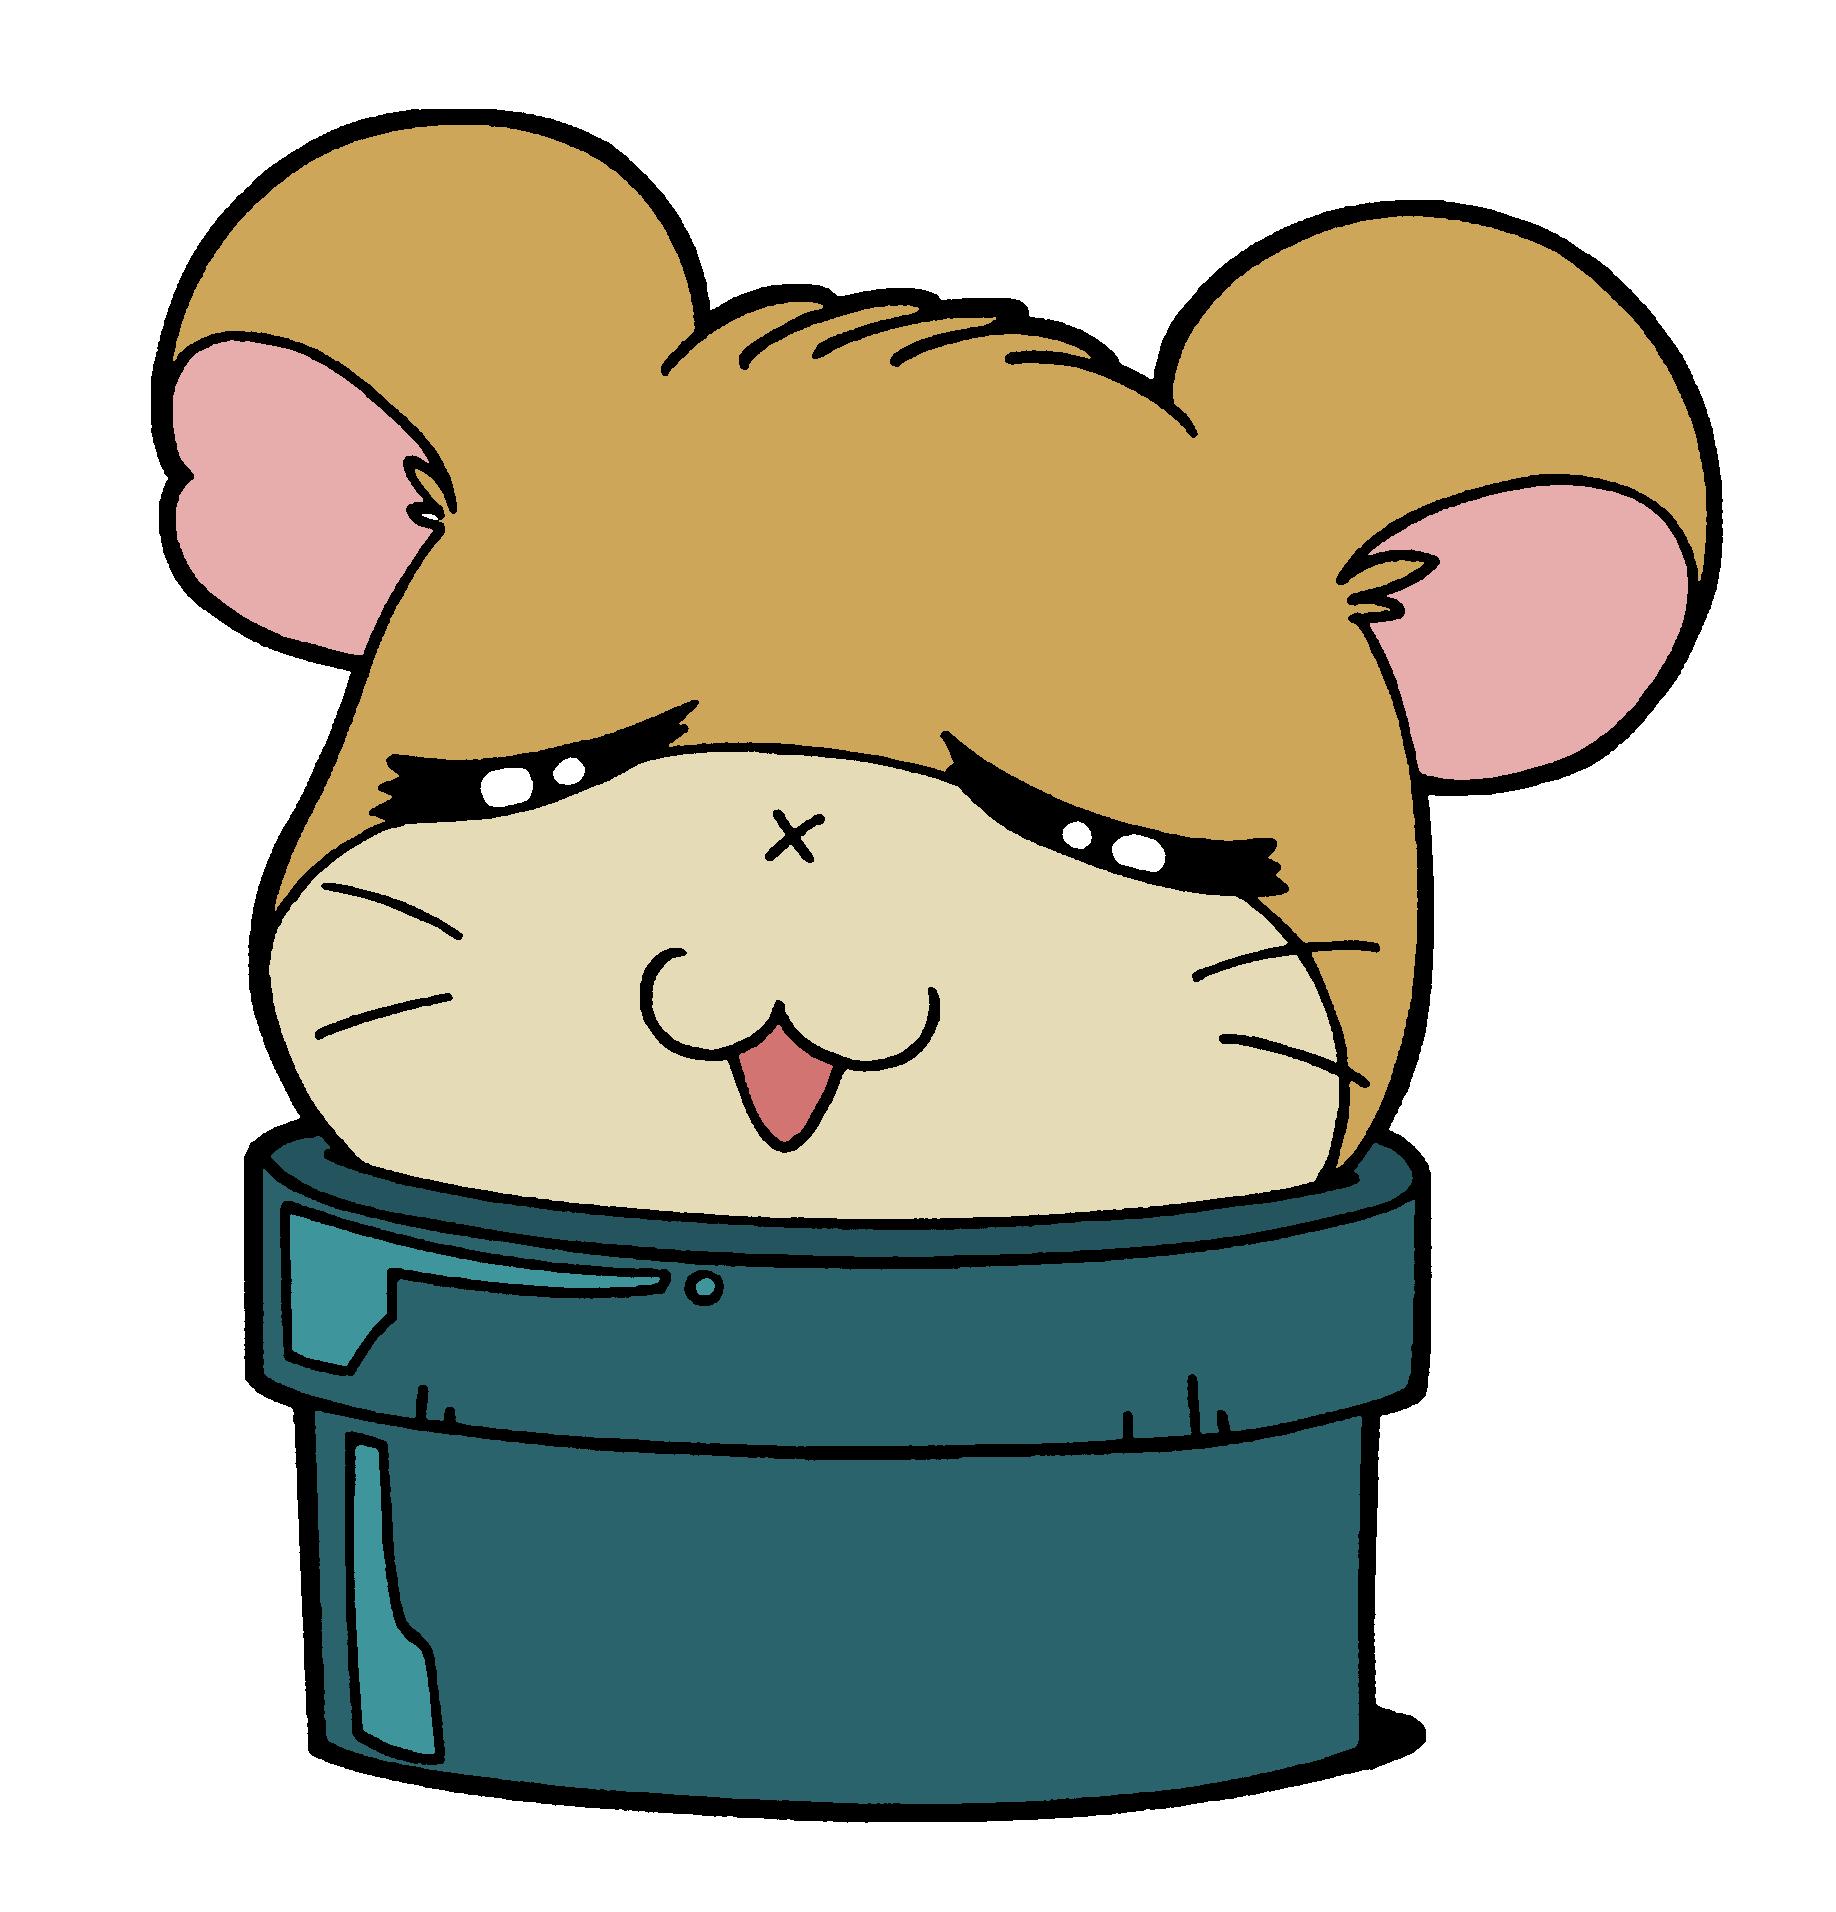 Hamster clipart colour. Stucky the hamtaro wiki